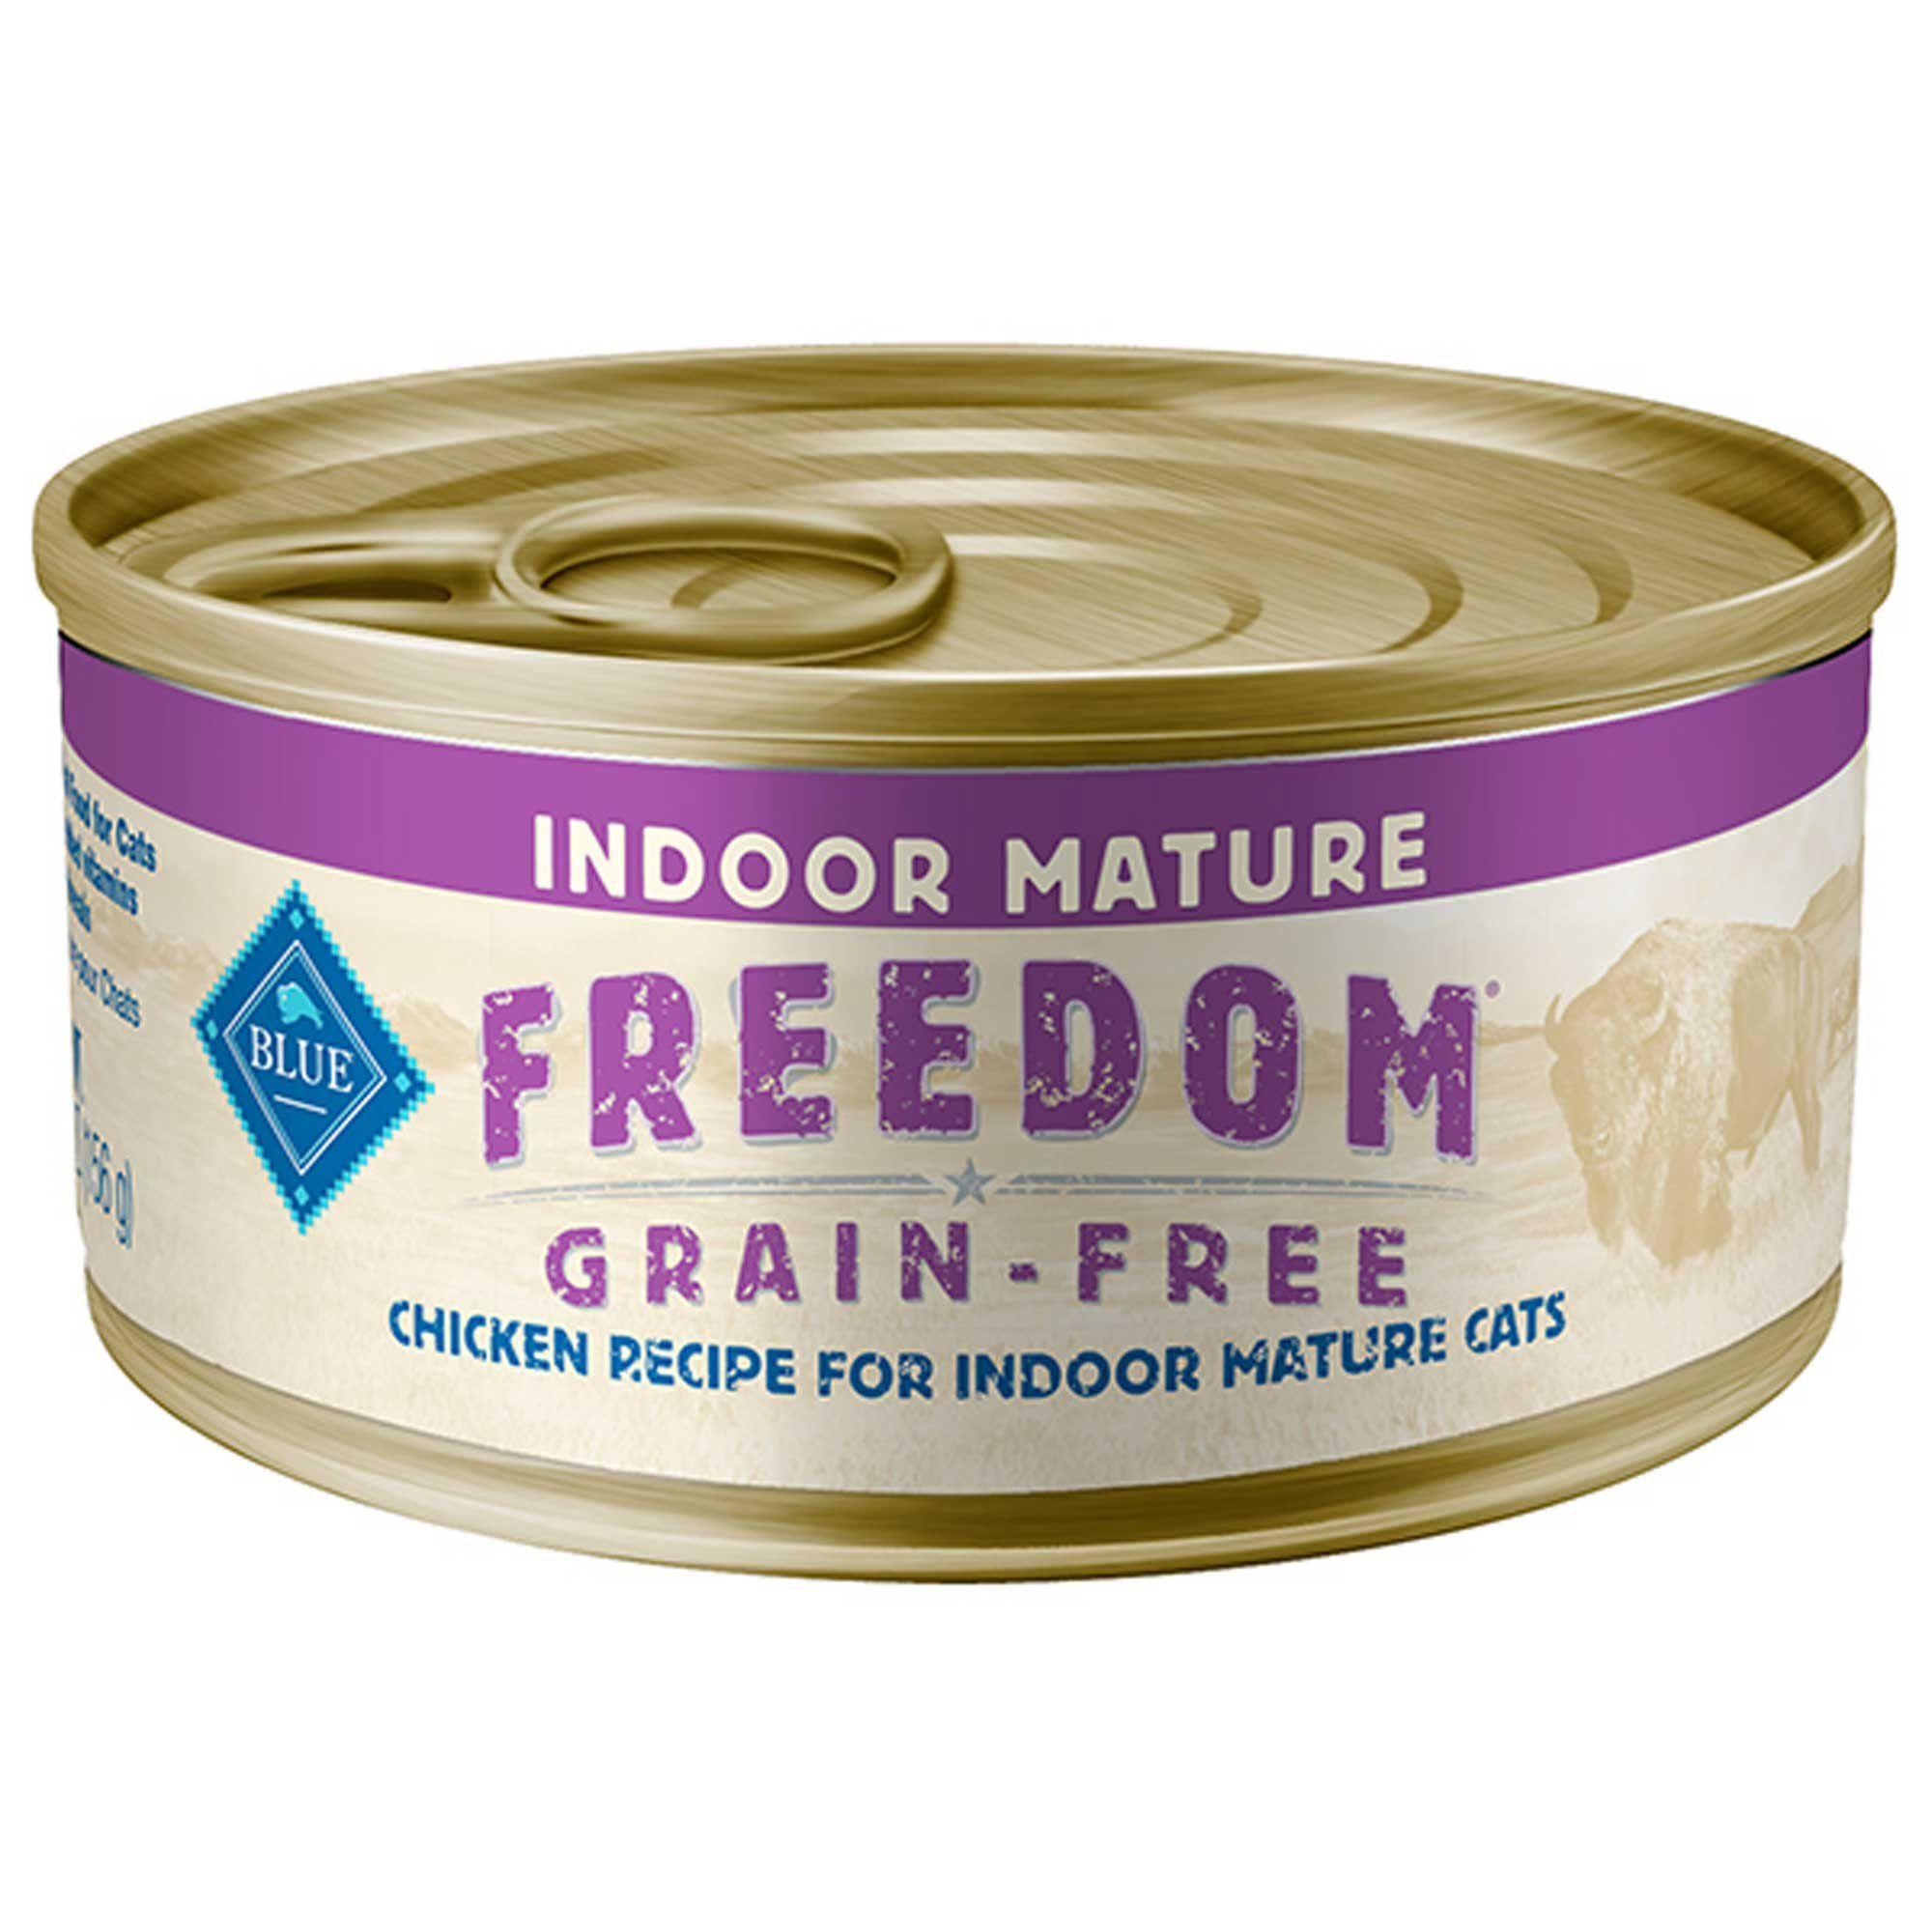 Blue Buffalo Blue Freedom Grain Free Indoor Chicken Senior Canned Cat Food 5 5 Oz Case Of 24 24 X 5 5 Oz Canned Cat Food Grain Free Food